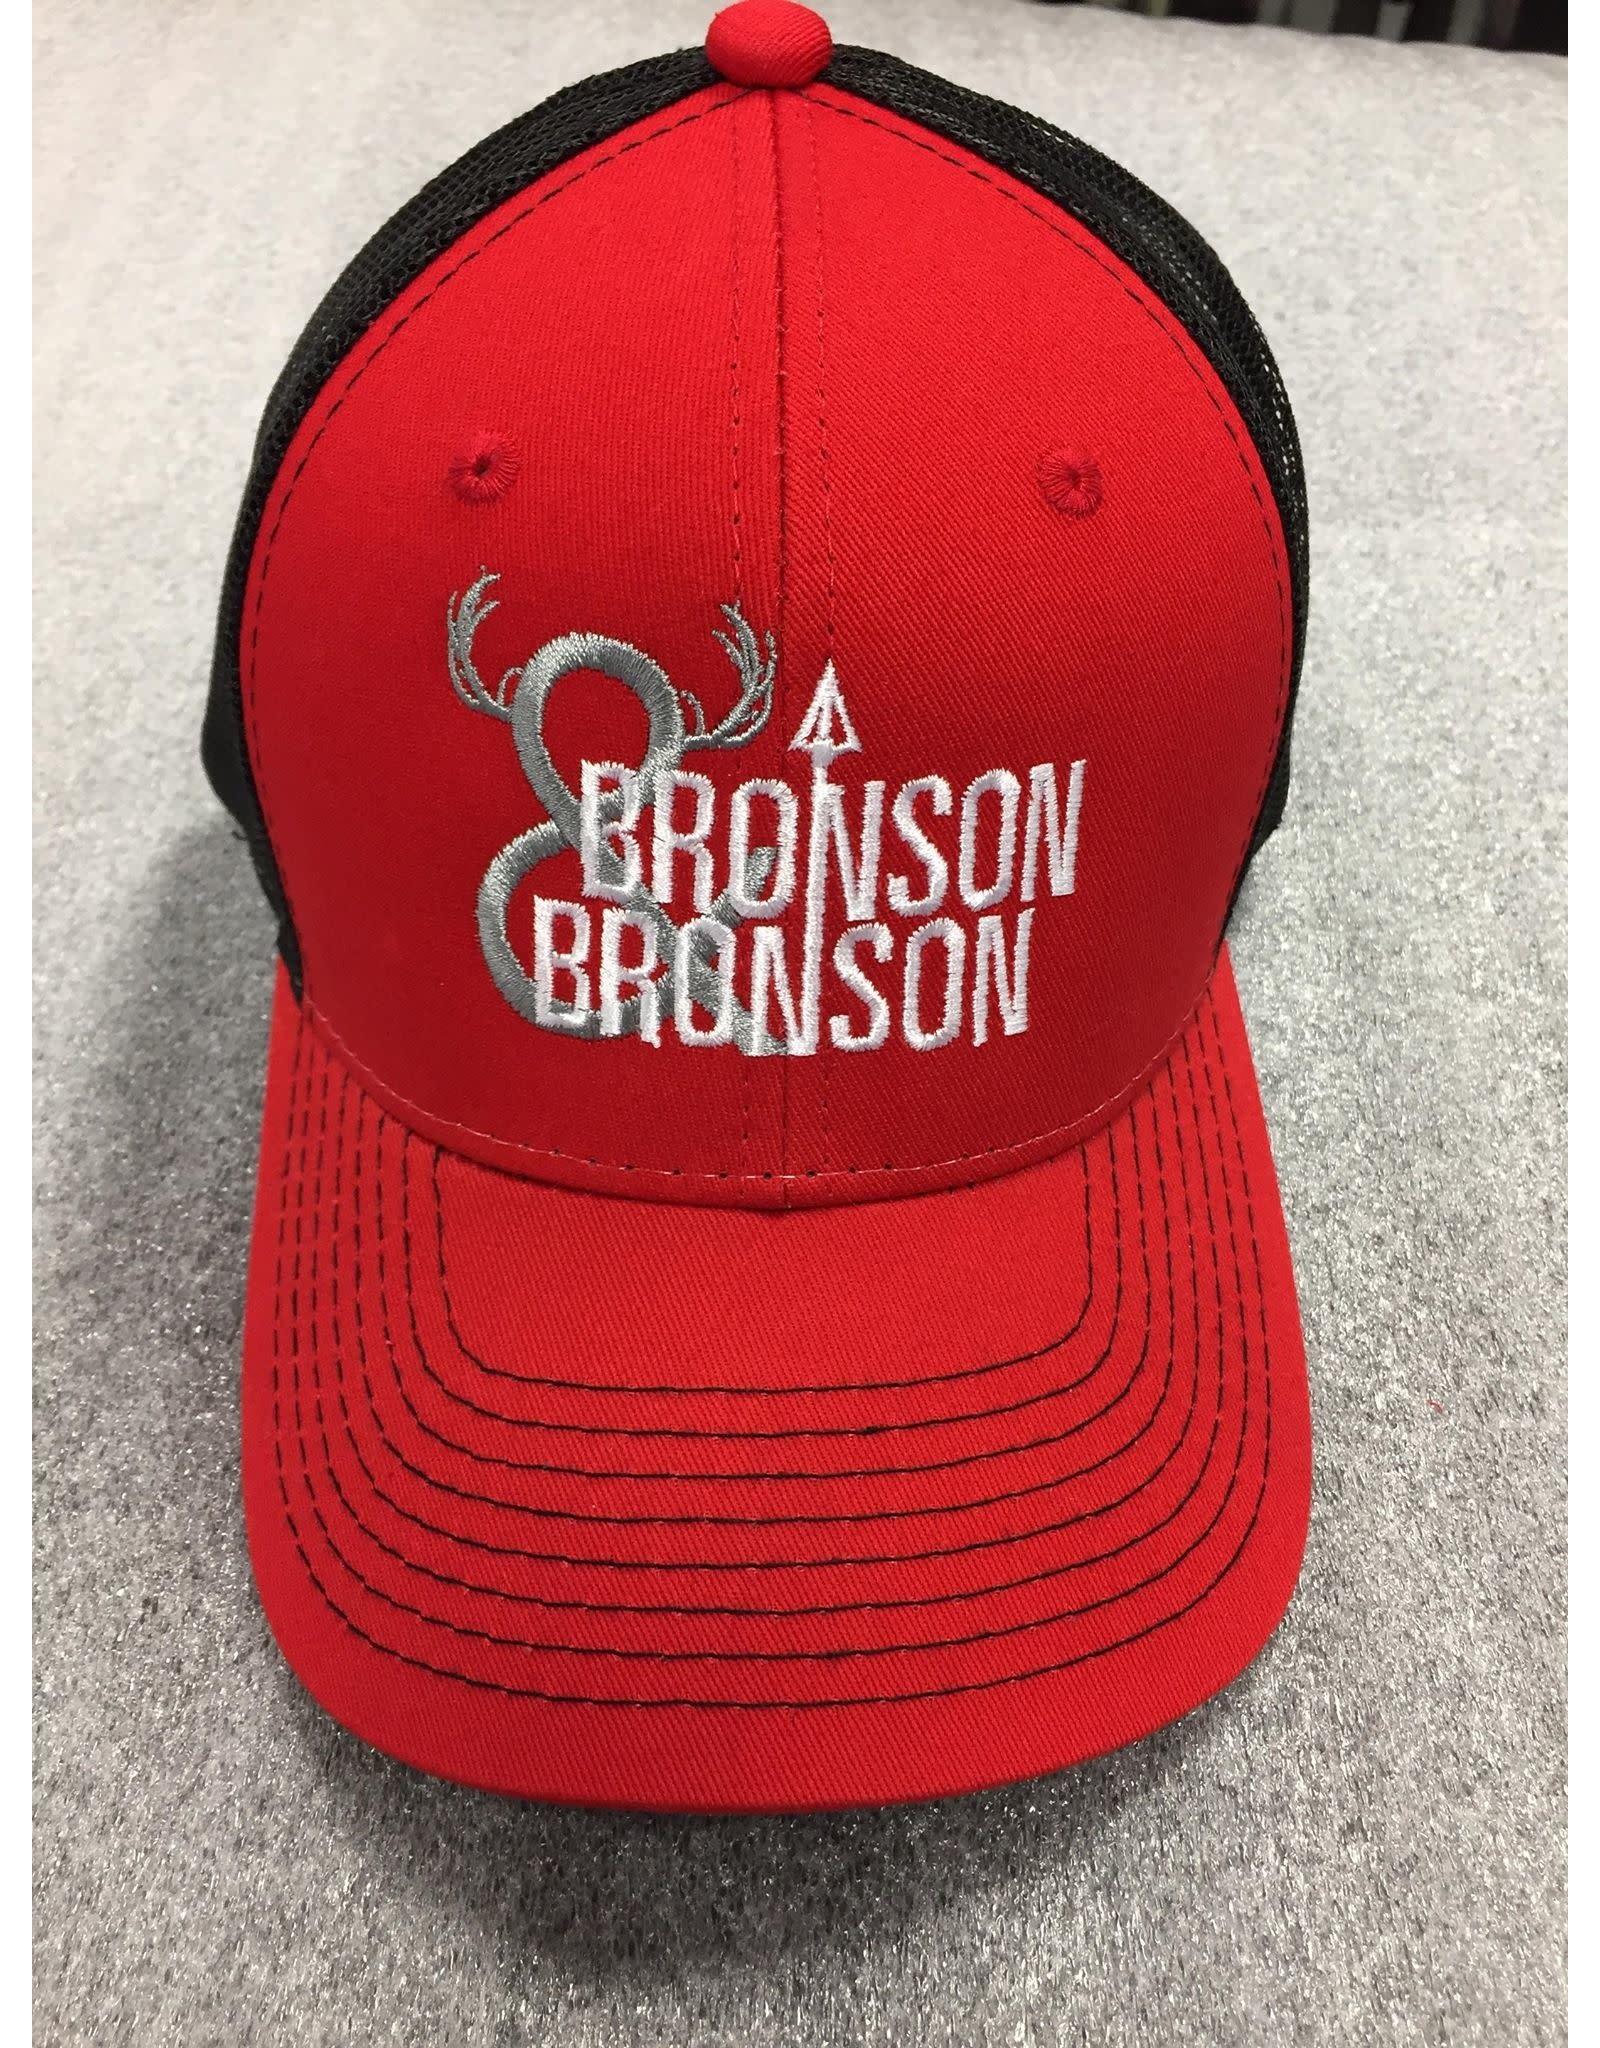 AJM International Unisex Adult Bronson & Bronson Hat O/S Red/Black